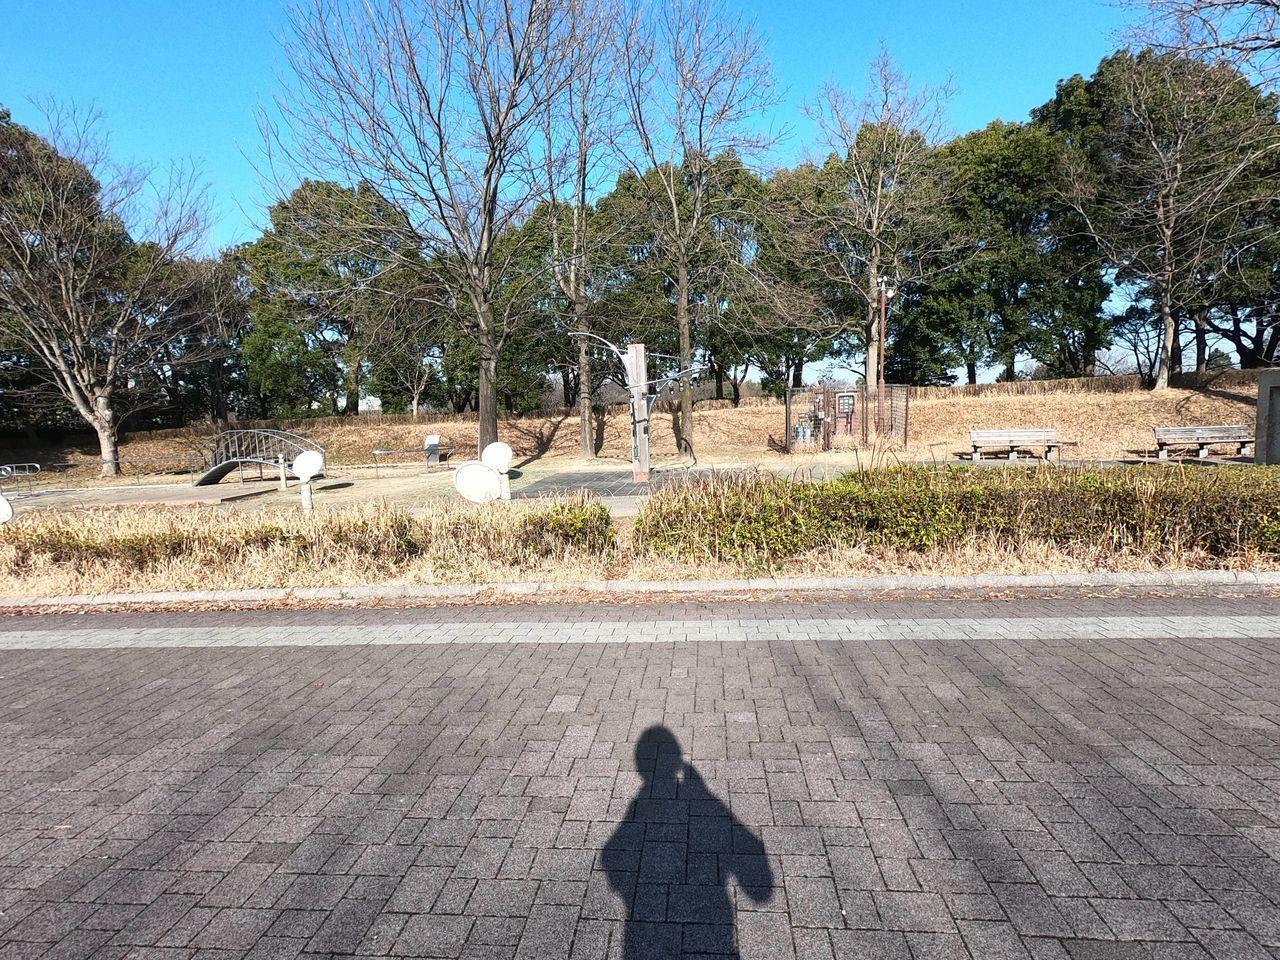 kenkounomori_img8_1